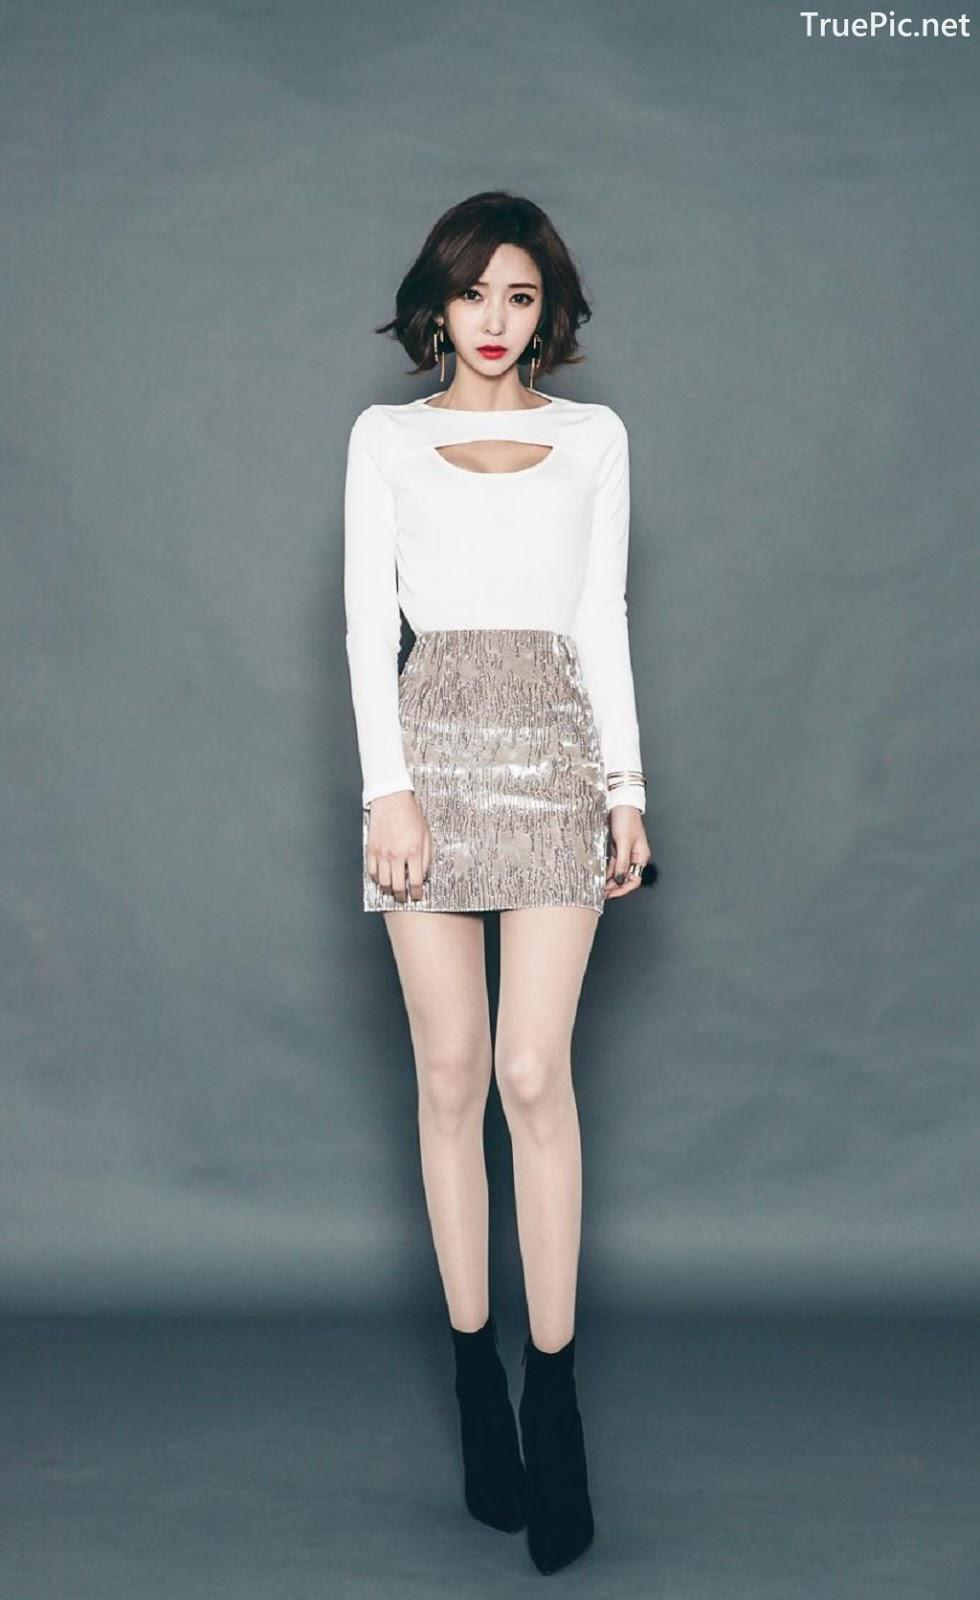 Image Ye Jin - Korean Fashion Model - Studio Photoshoot Collection - TruePic.net - Picture-7